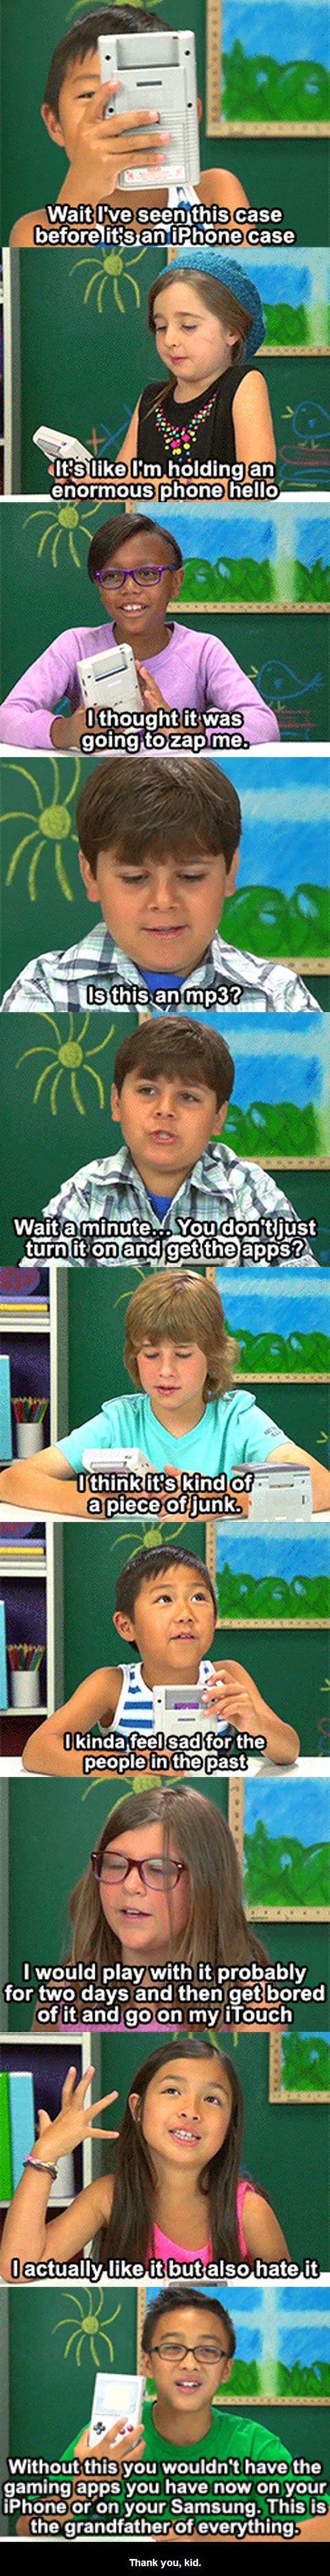 last kid totally gets it.